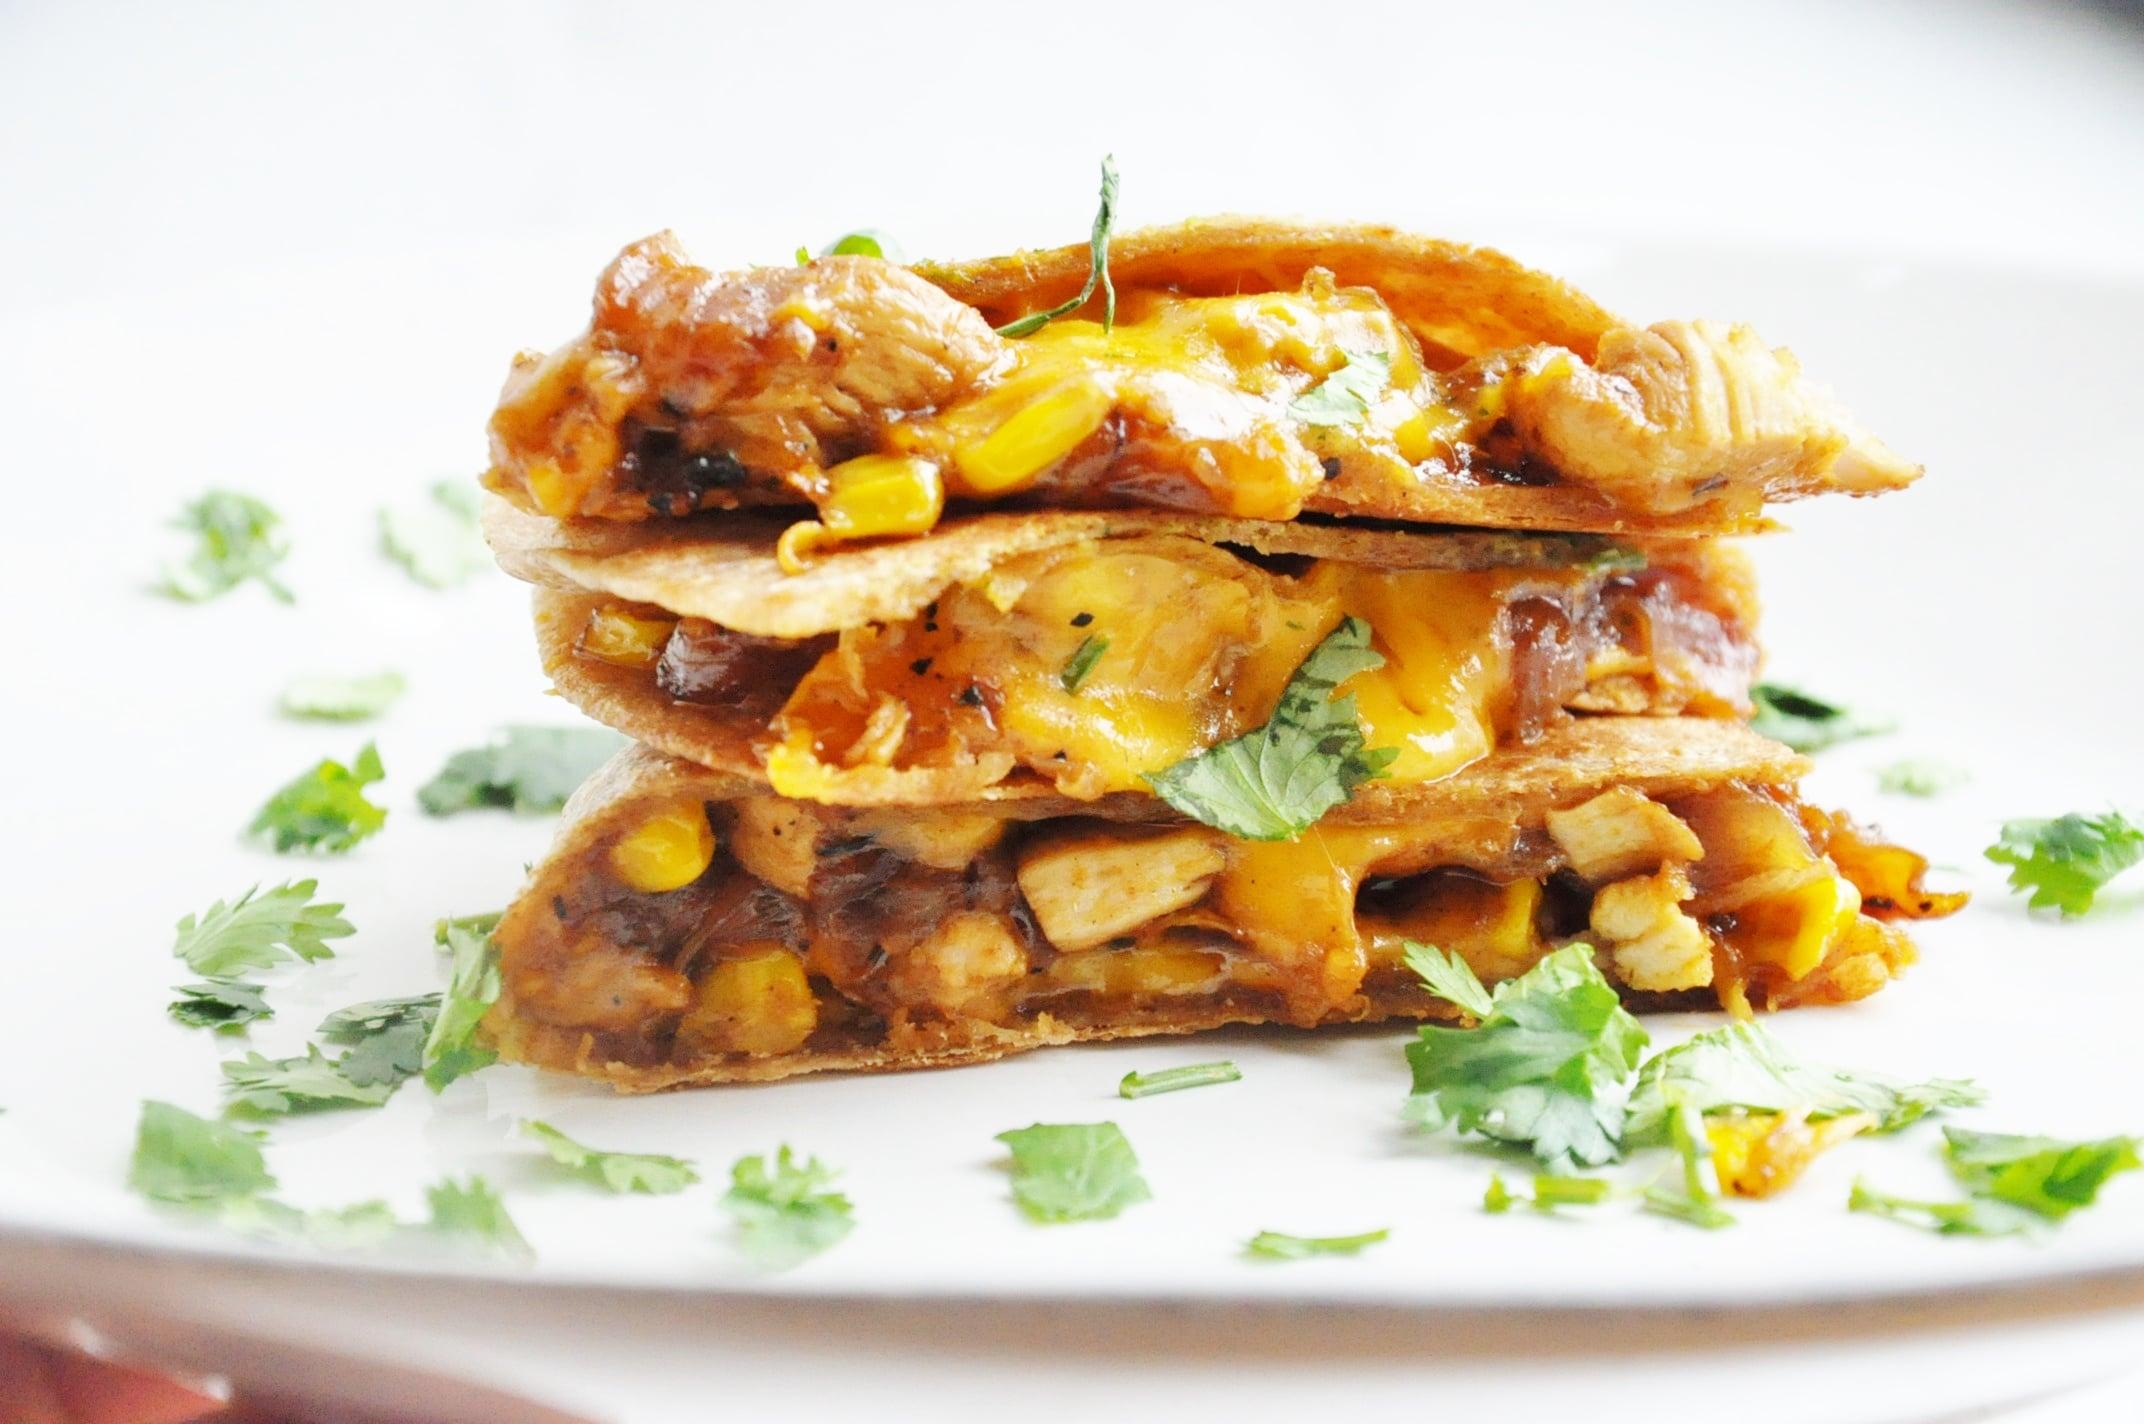 BBQ Chicken & Corn Quesadillas